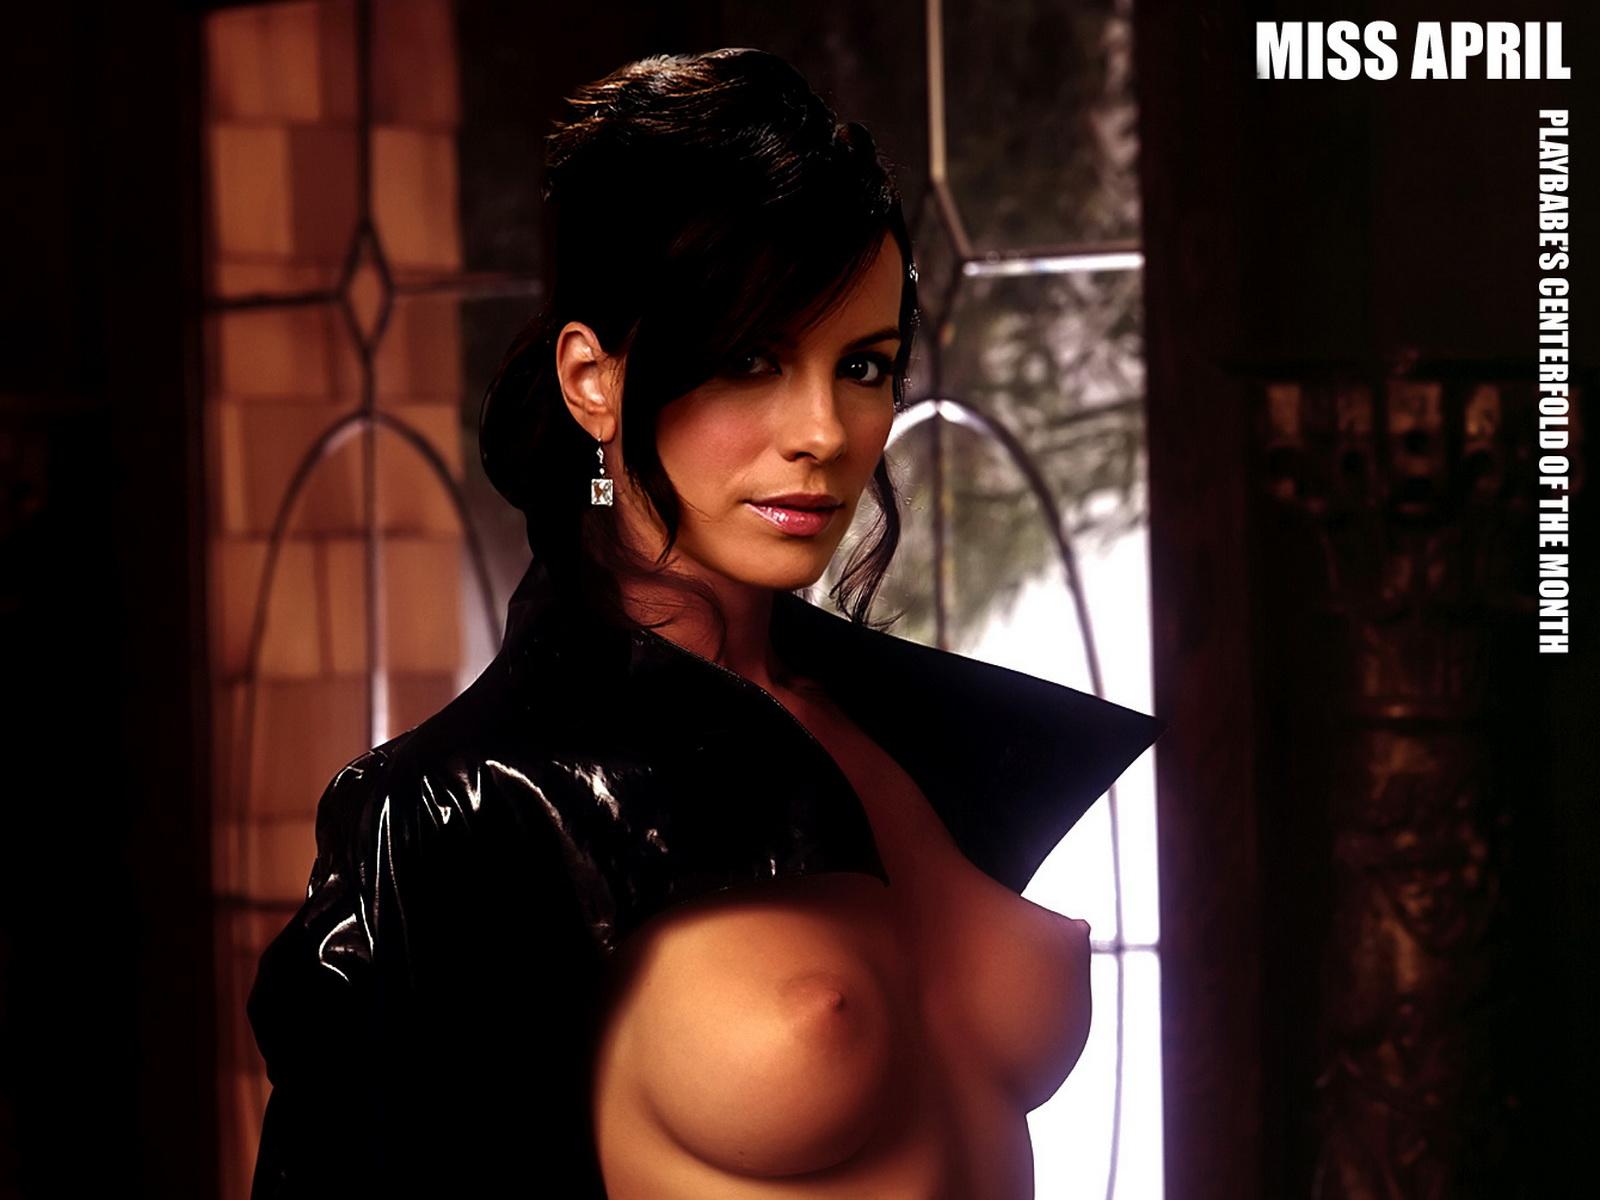 http://4.bp.blogspot.com/-vfFBrsDmhCE/TtMYAXUgFdI/AAAAAAAAC-c/XYsWMN4yq4s/s1600/Kate+Beckinsale+nude+Playboy+Miss+April+naked+Playmate.jpg